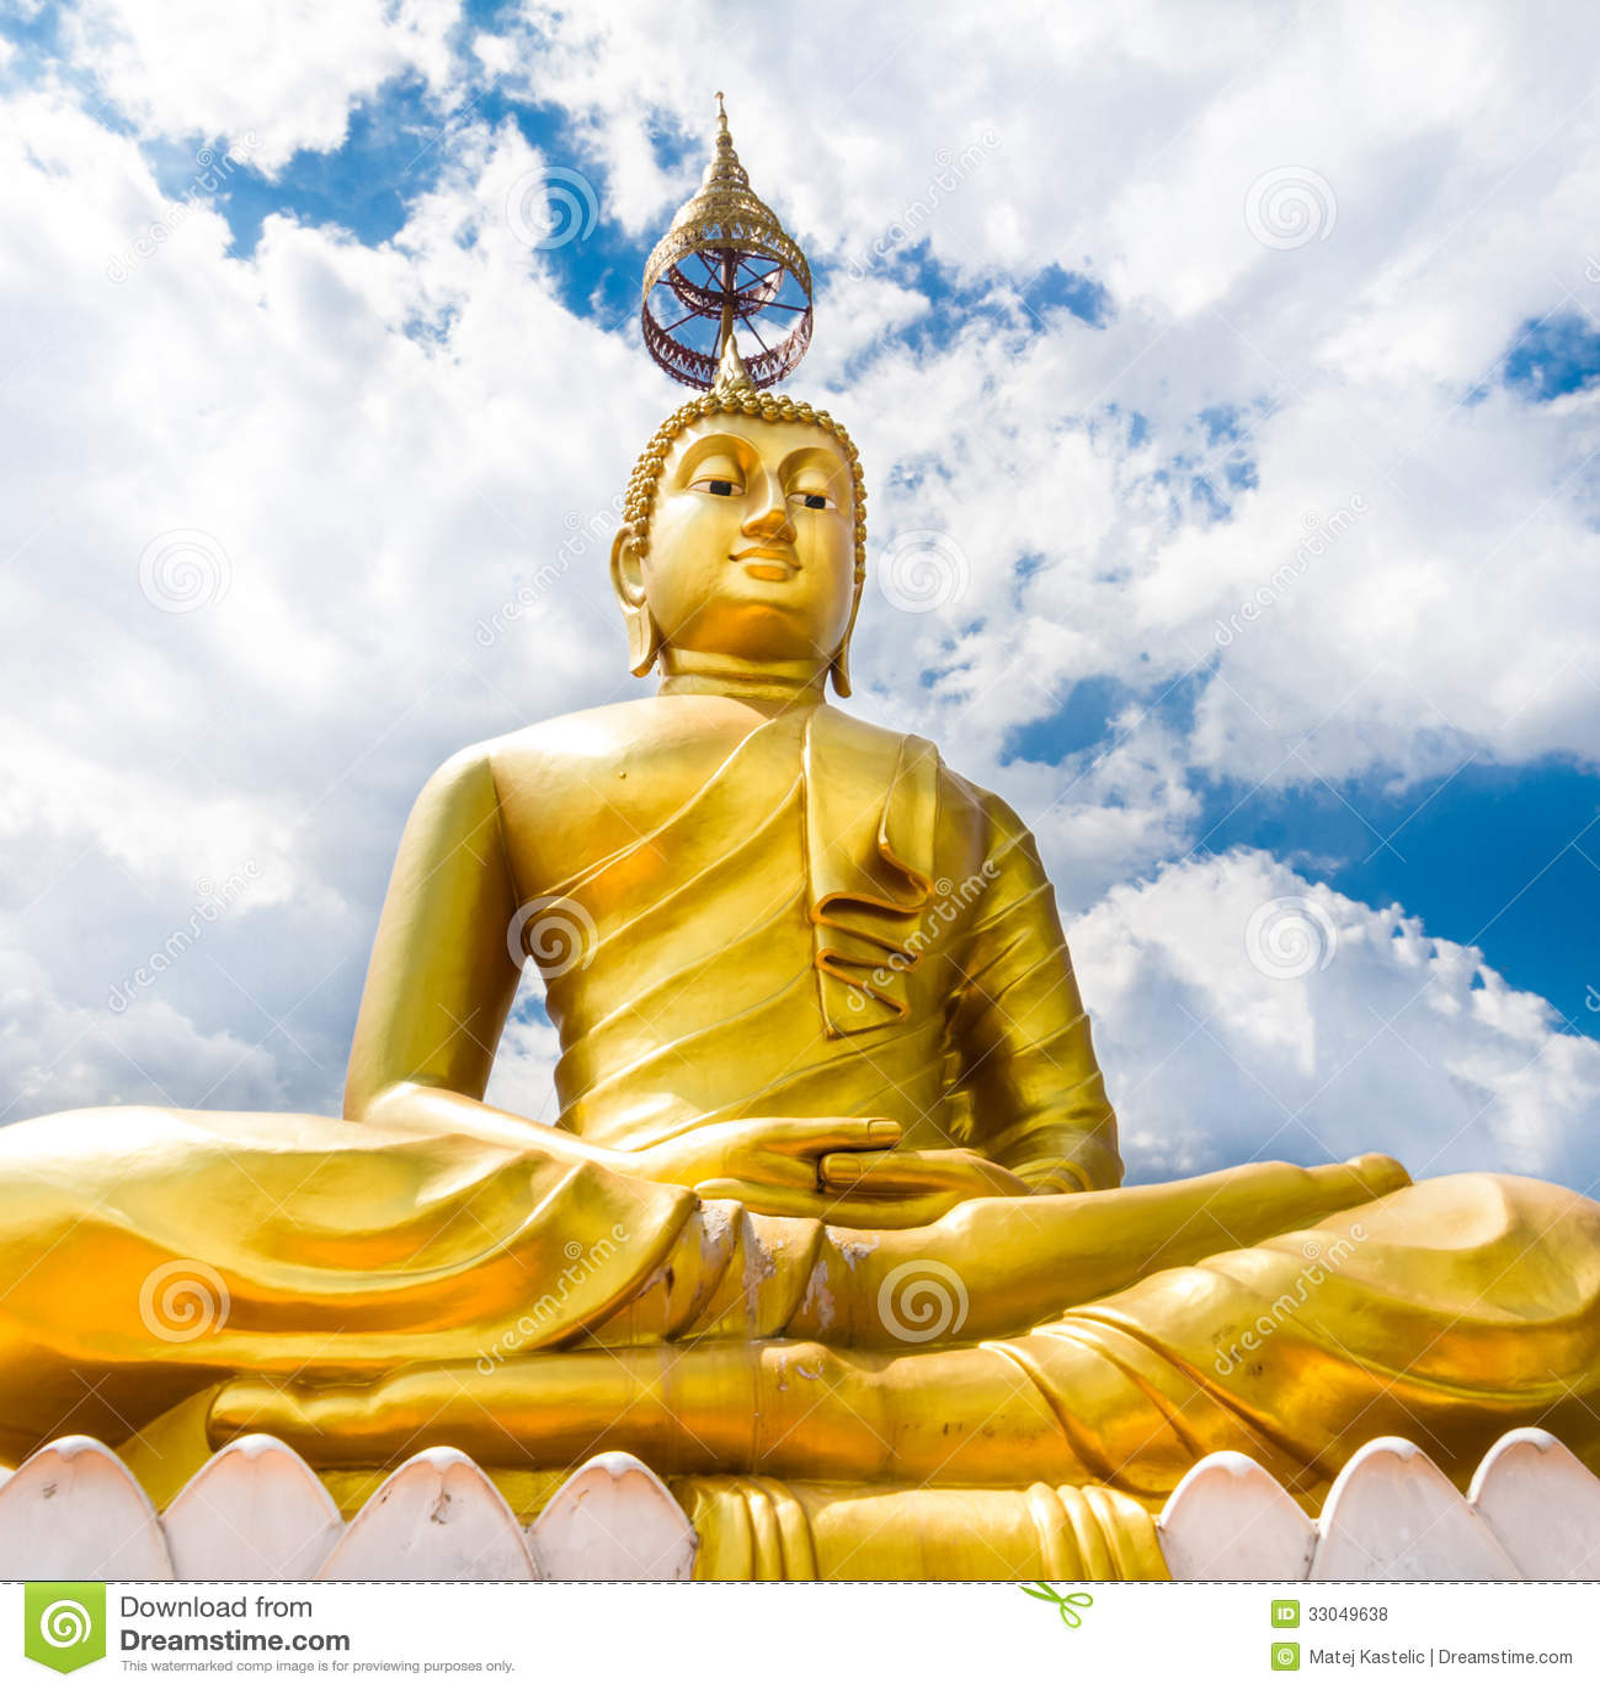 ... limestone tower - Krabi Tiger Cave - Wat Tham Sua, Krabi, Thailand